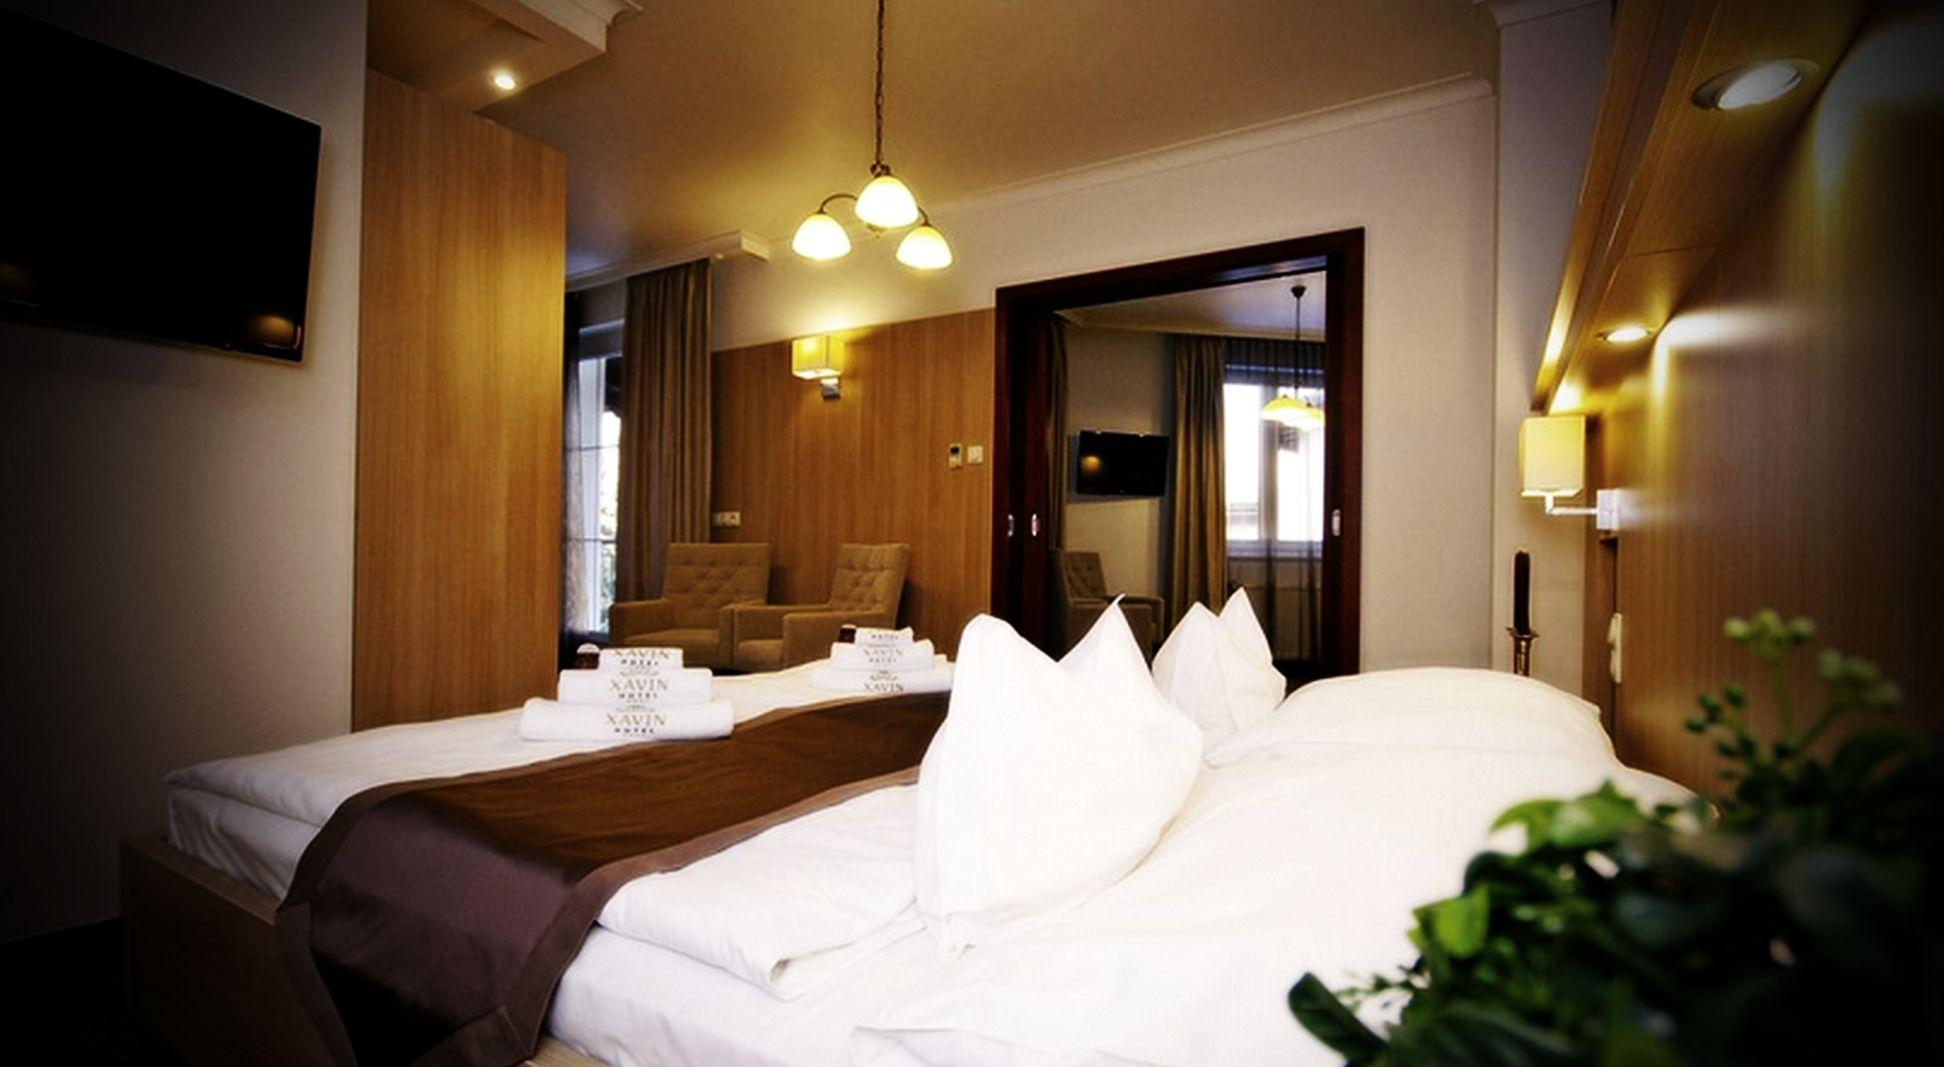 spa-wellness/banja-harkanj/hotel-xavin/xavin-hotel-soba-2.JPG